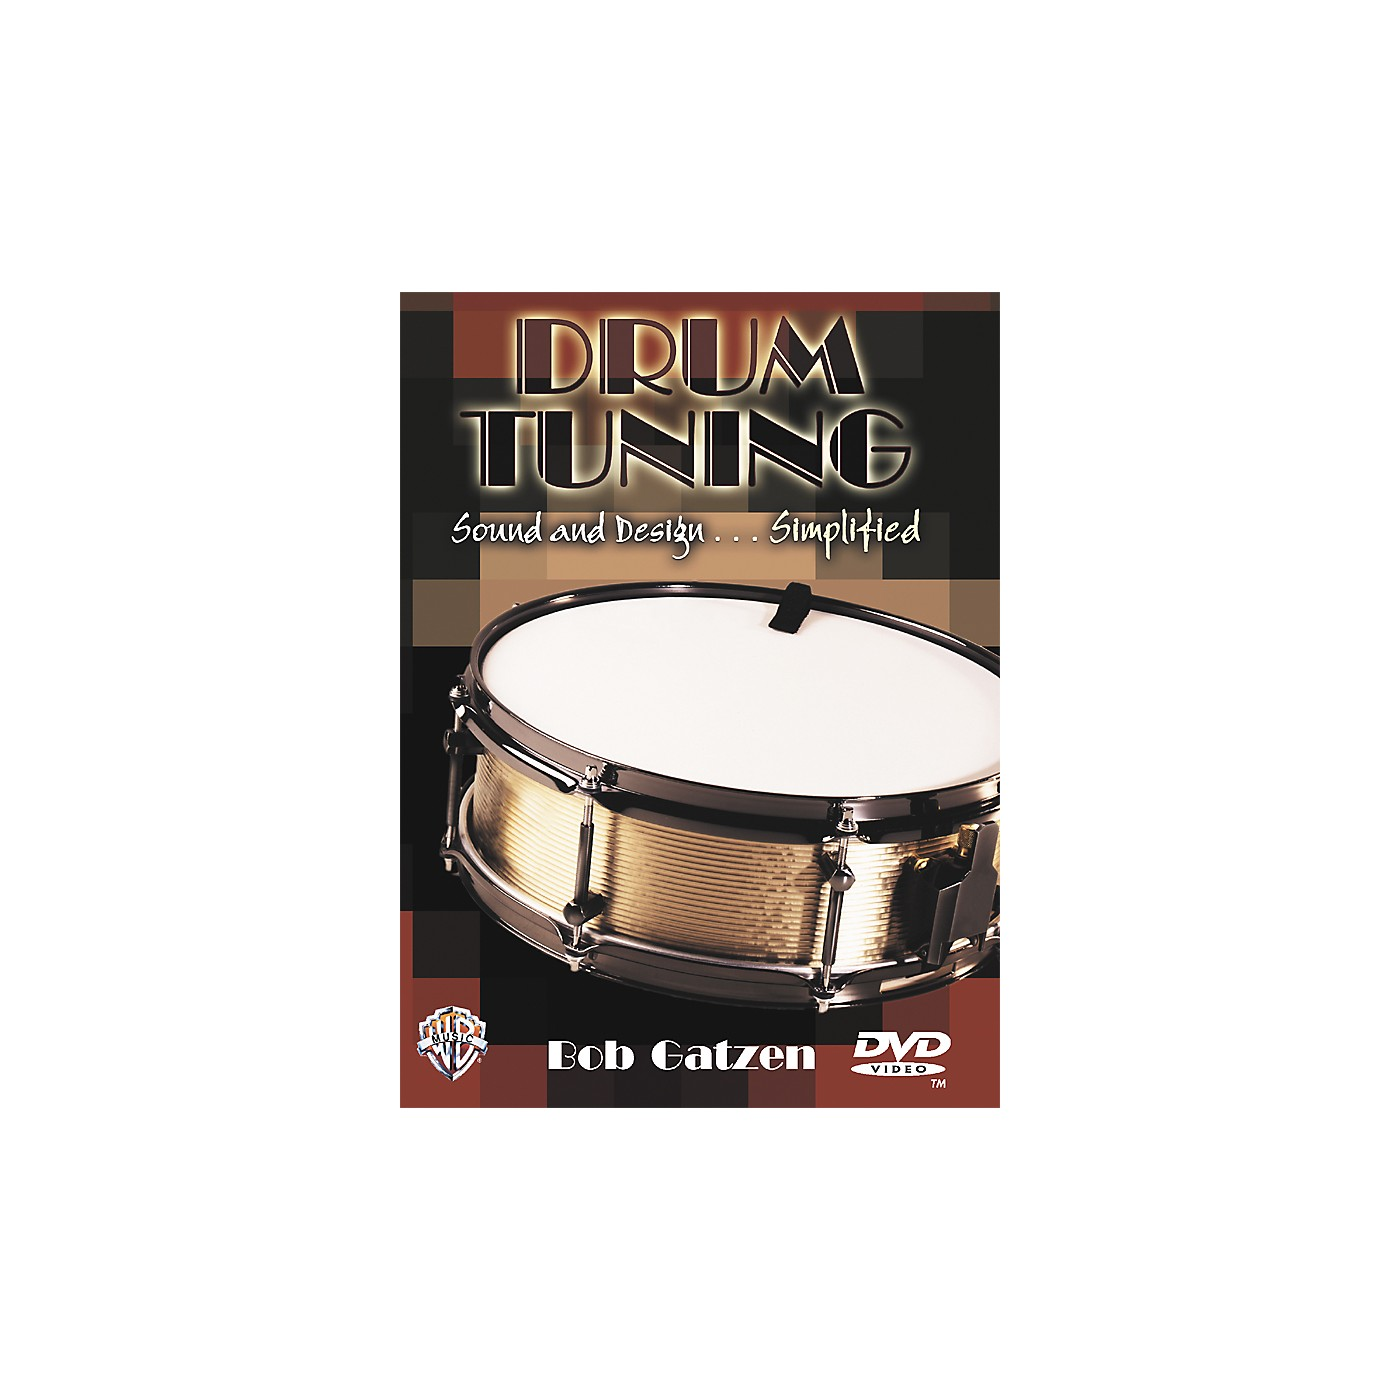 Warner Bros Drum Tuning - Sound and Design..Simplified DVD thumbnail